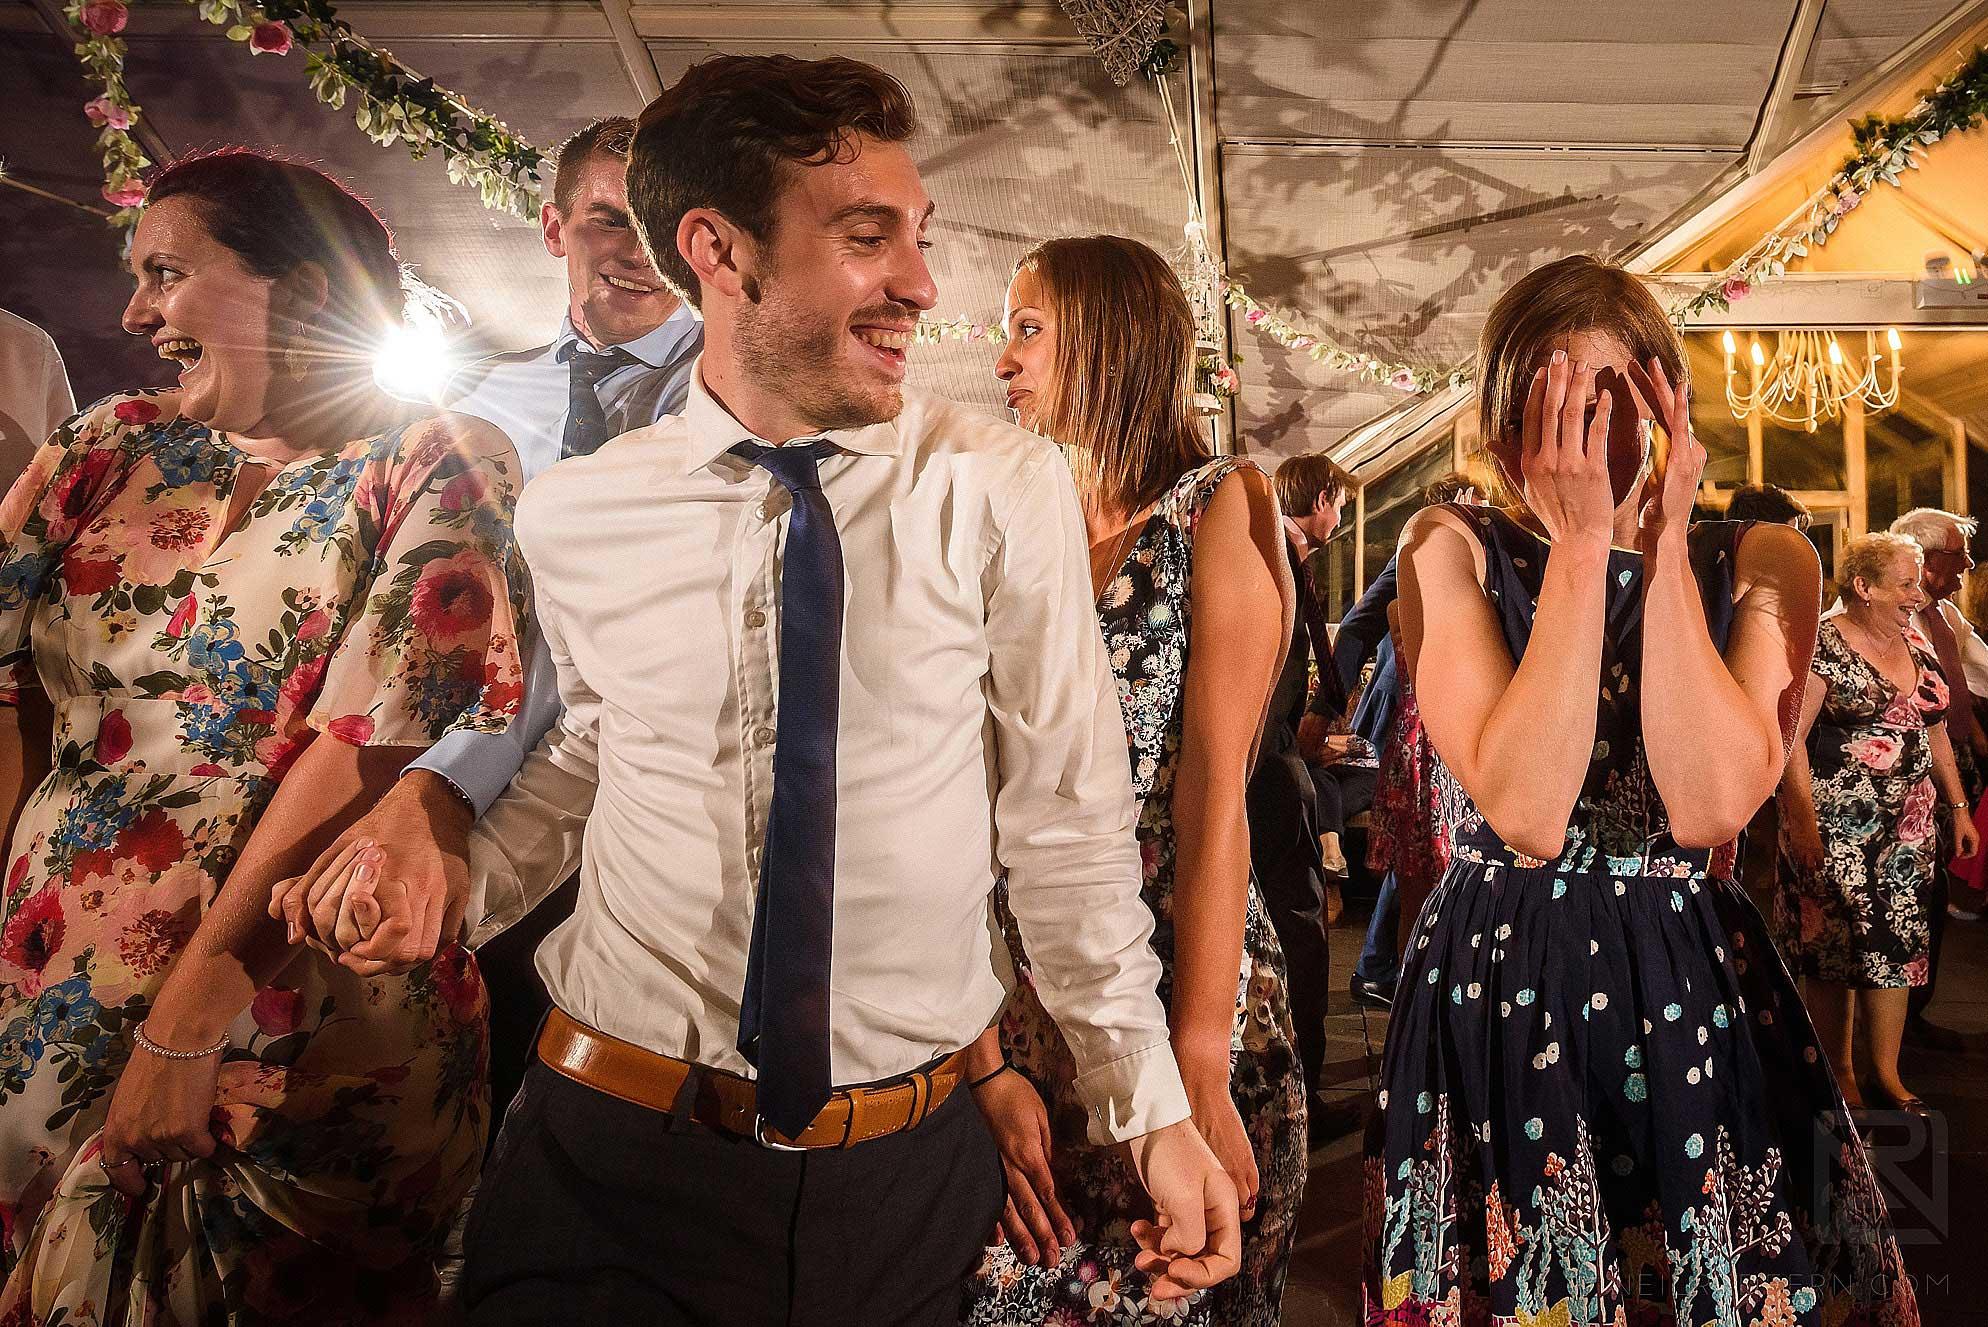 Cèilidh dancing at wedding